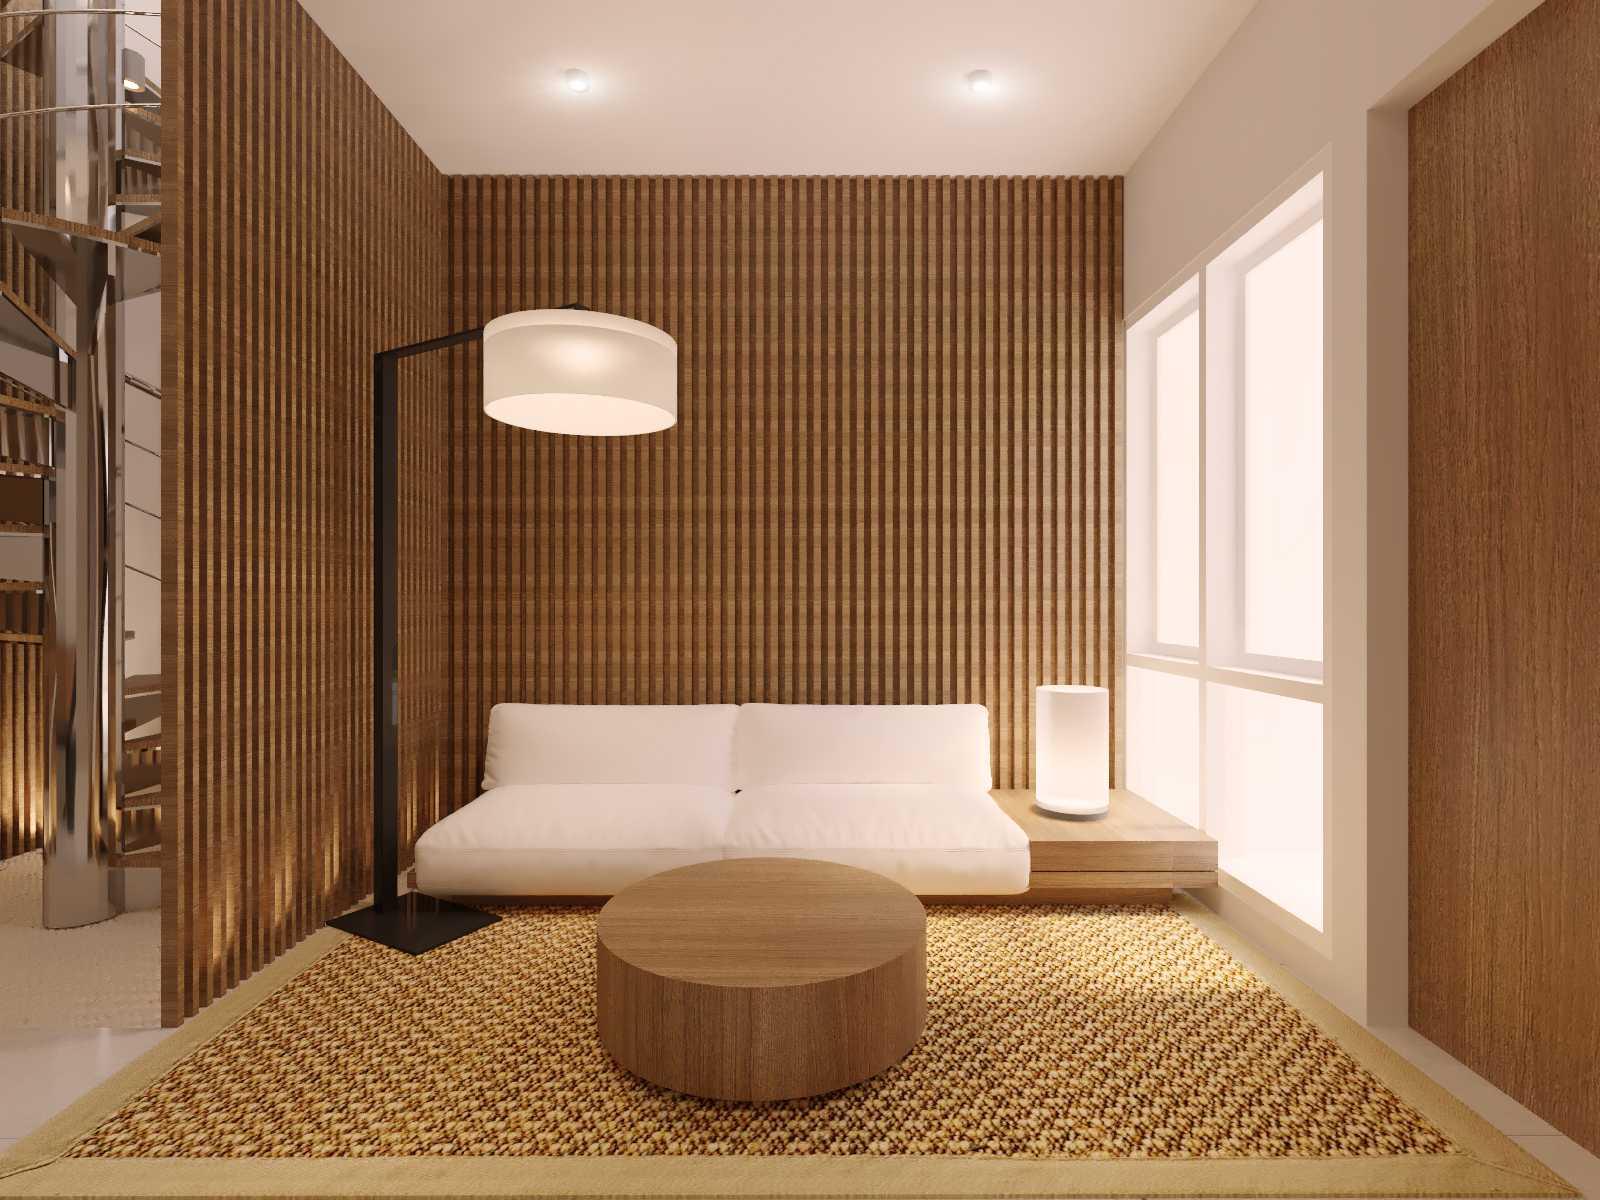 Mitrasasana - Design & Build Yg House Bekasi, Kota Bks, Jawa Barat, Indonesia Bekasi, Kota Bks, Jawa Barat, Indonesia Mitrasasana-Design-Build-Yg-House  78701